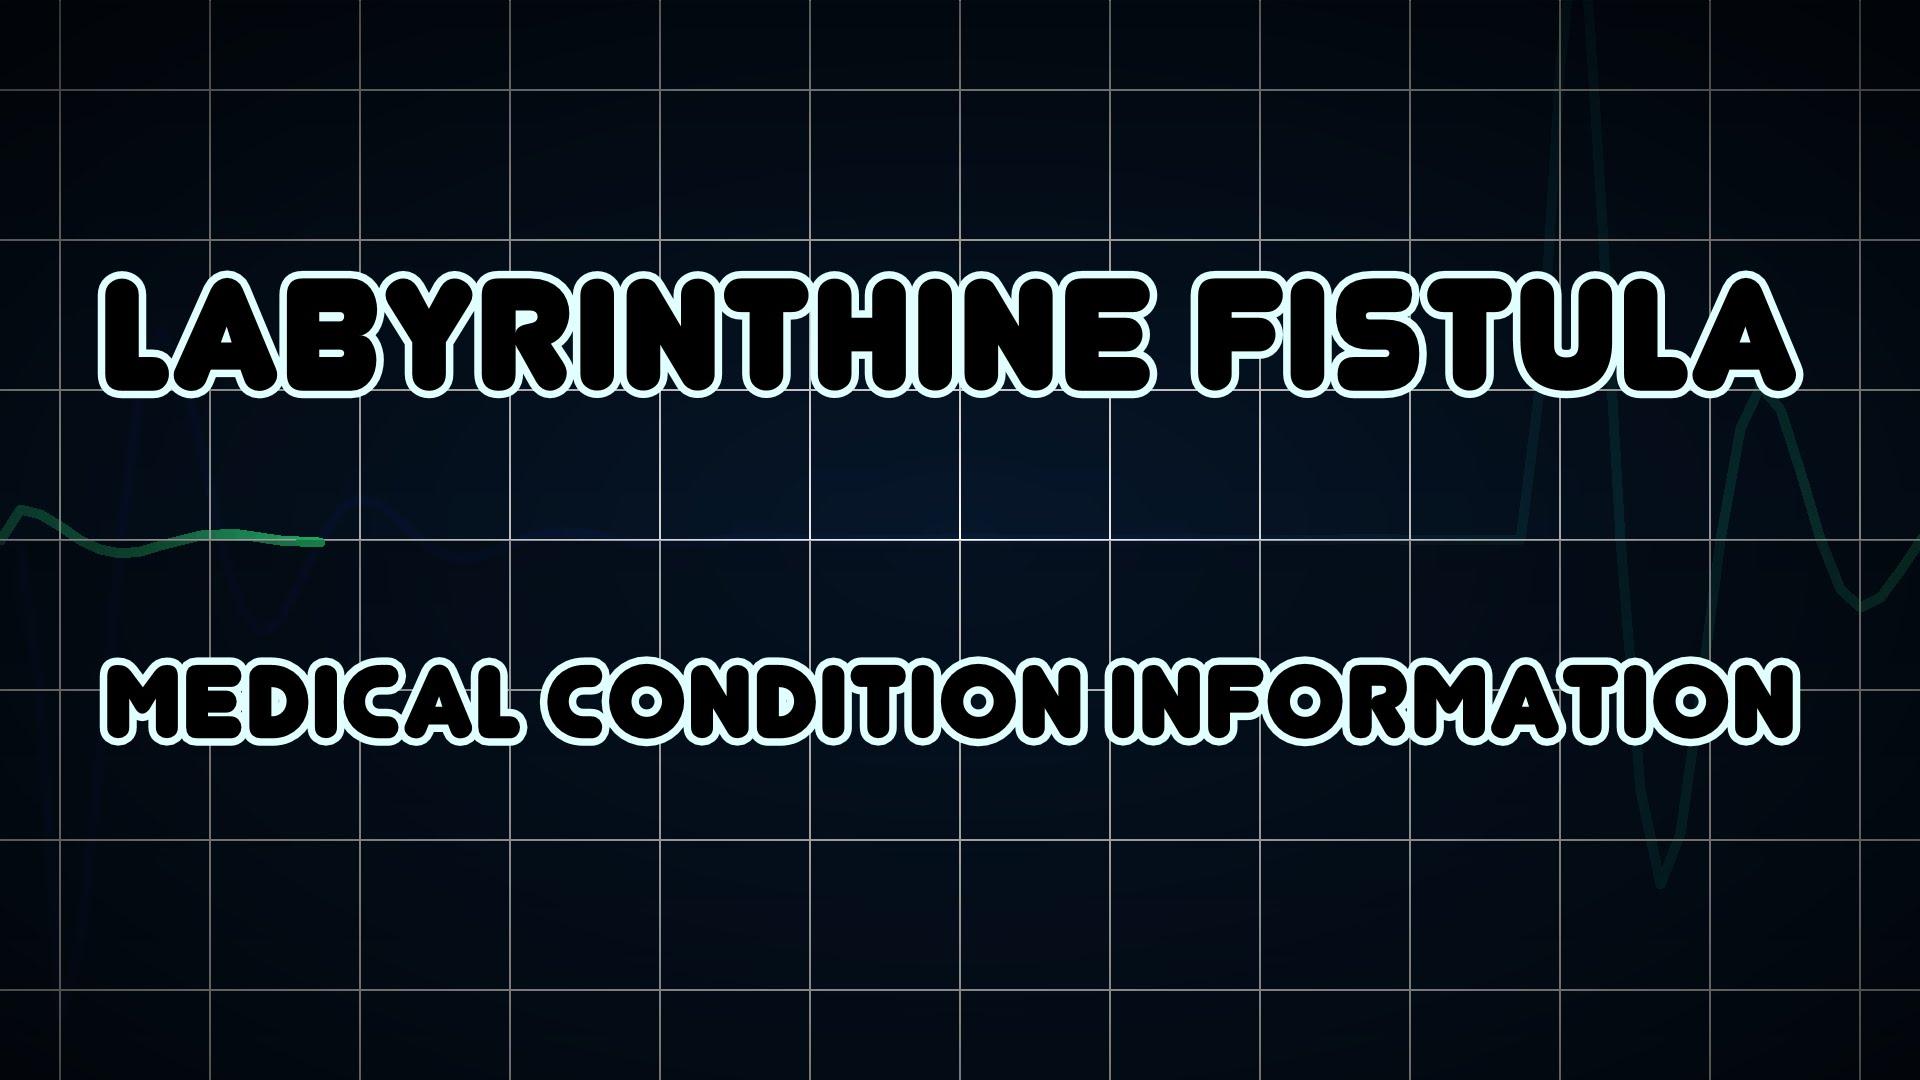 Labyrynthine fistula